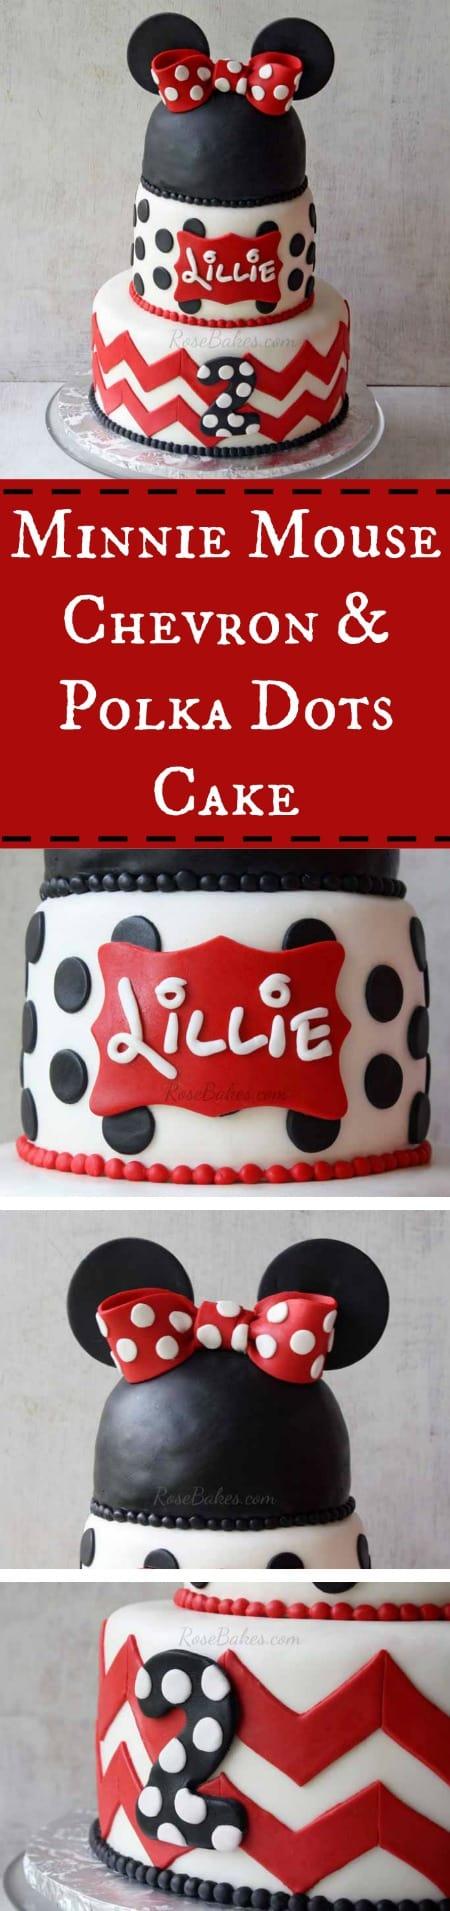 Minnie Mouse Chevron & Polka Dots Cake